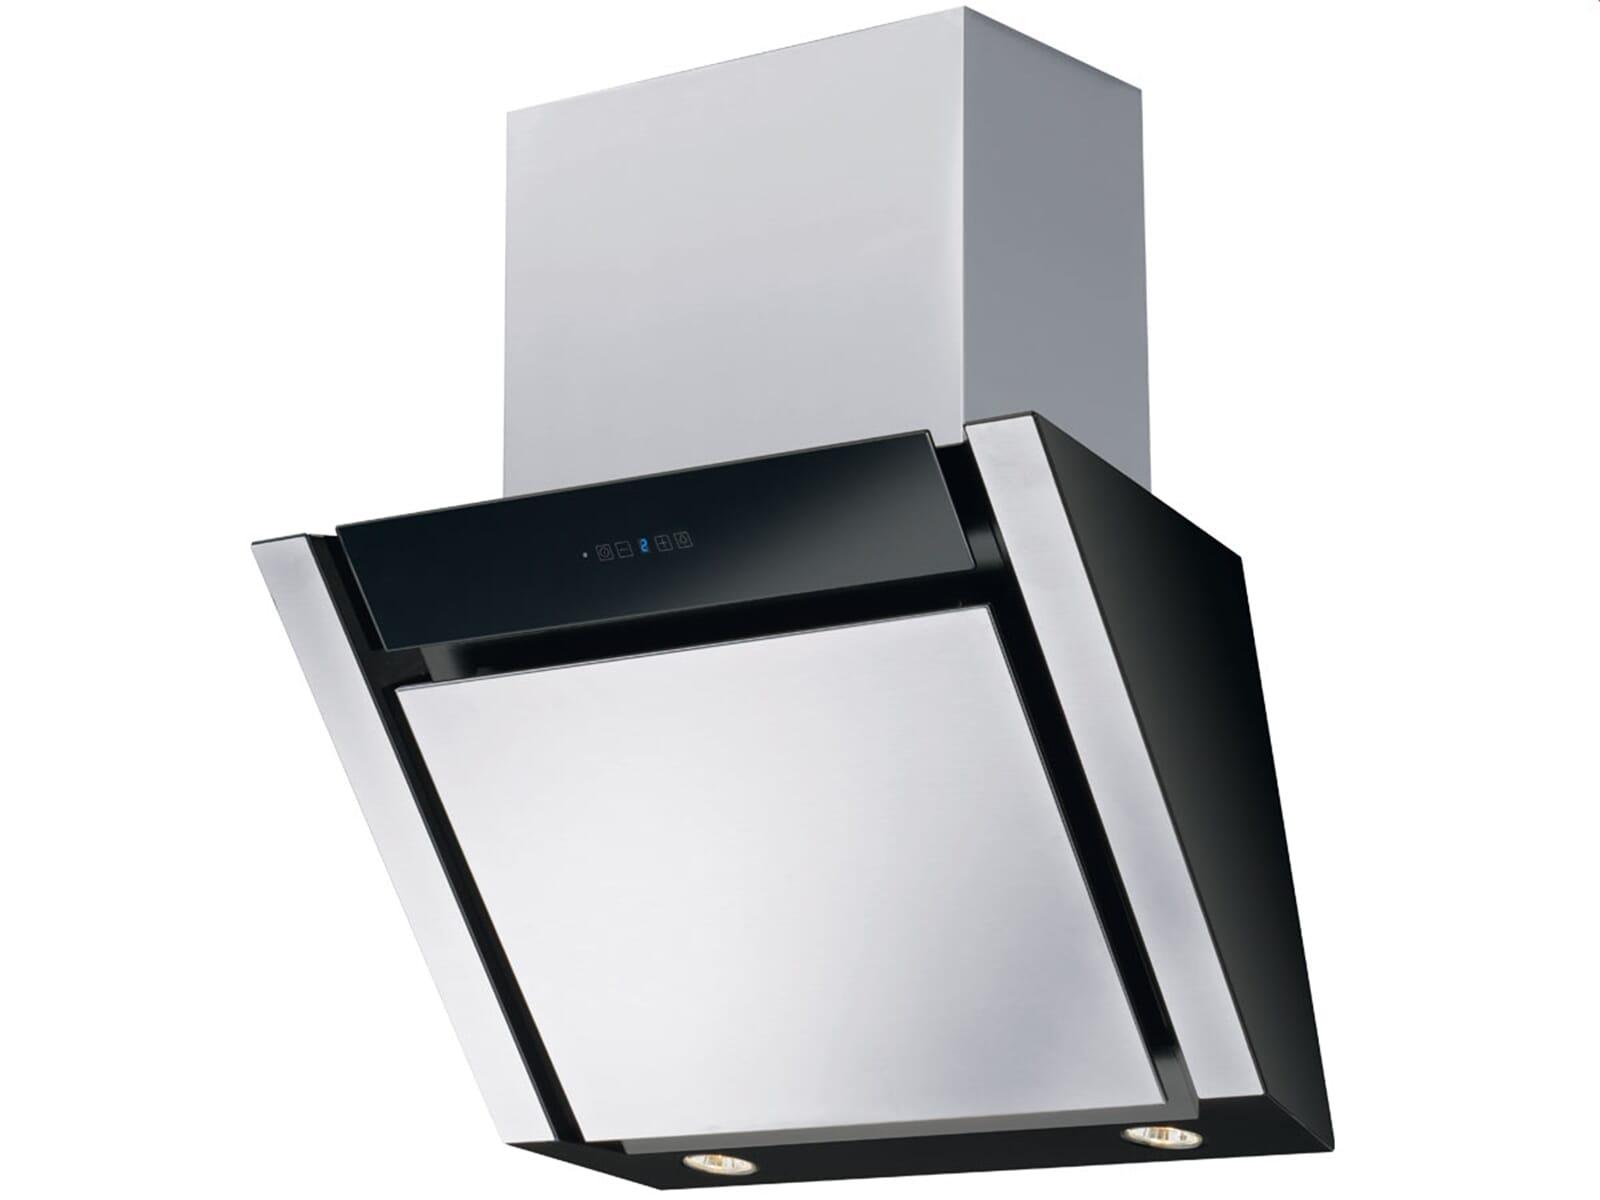 kopffrei wand dunstabzugshaube edelstahl wandesse 60cm. Black Bedroom Furniture Sets. Home Design Ideas